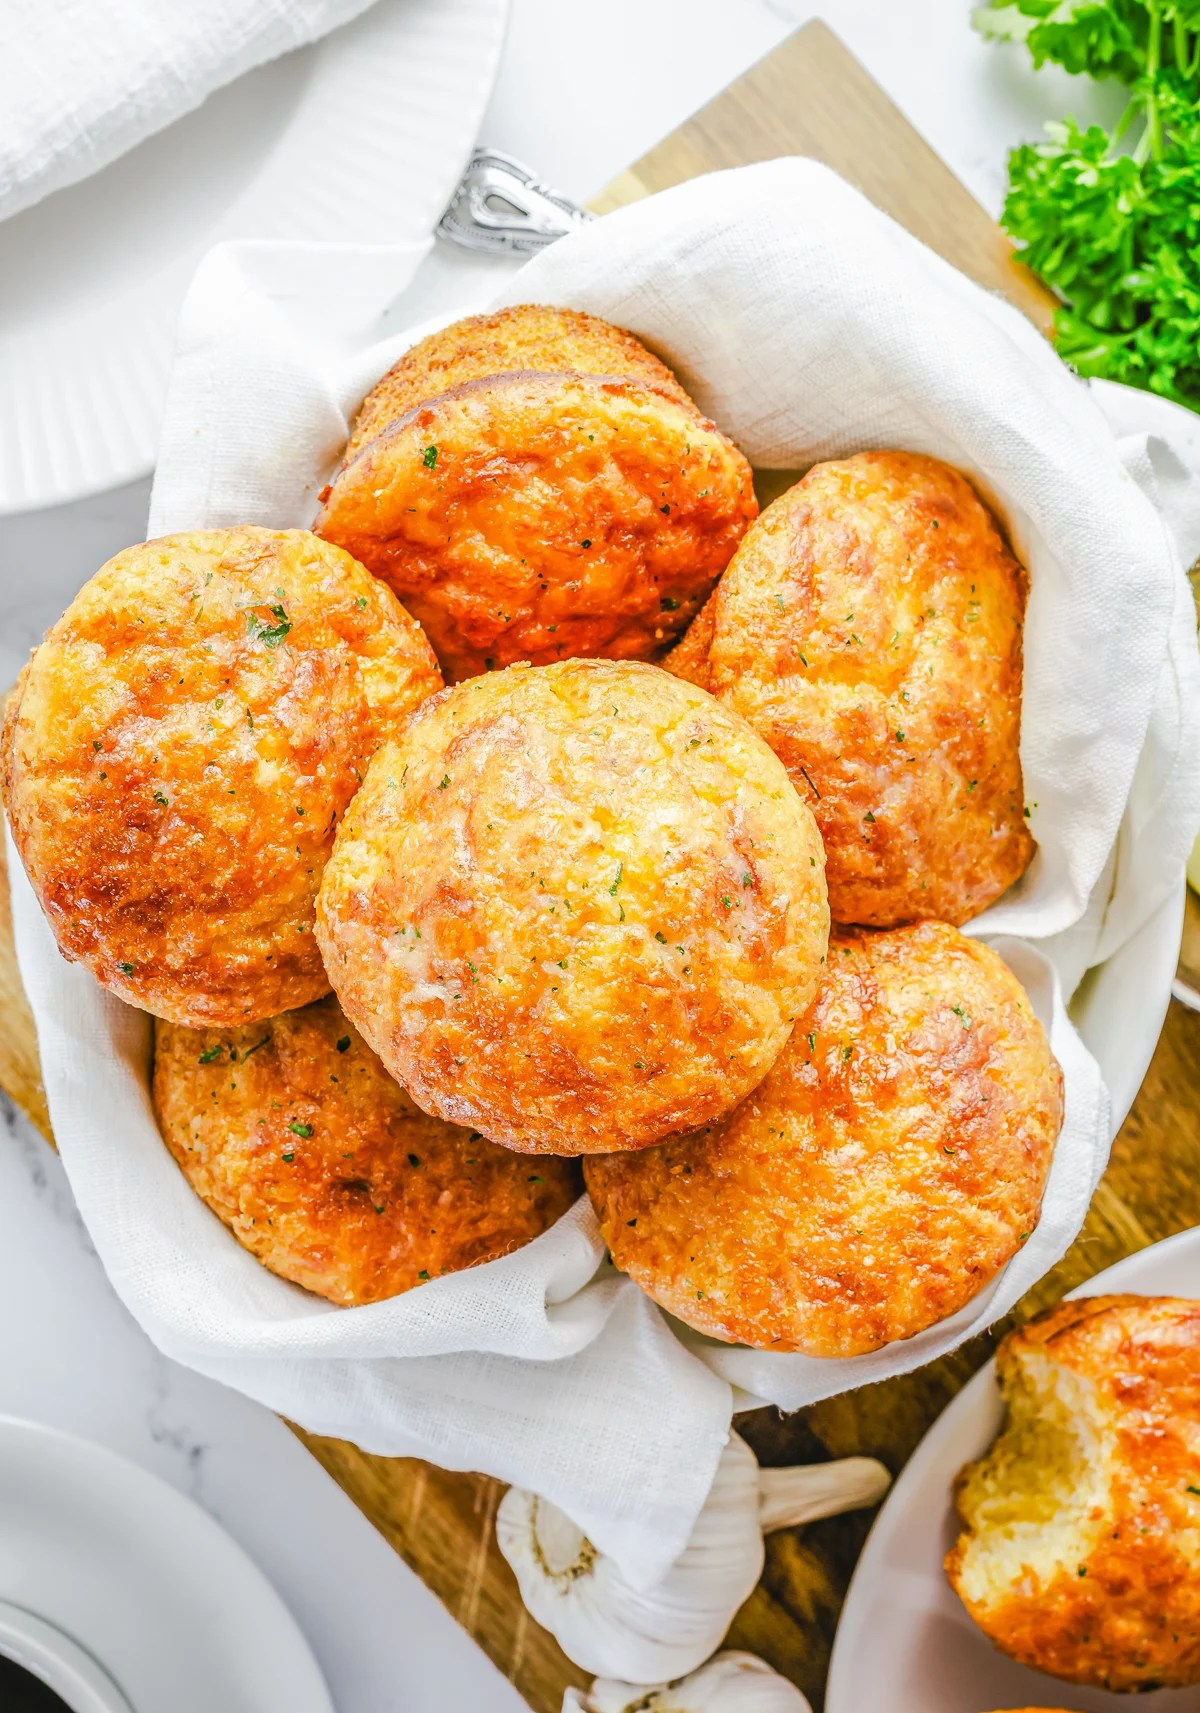 Overhead photo of Garlic Cheese Muffins in basket.